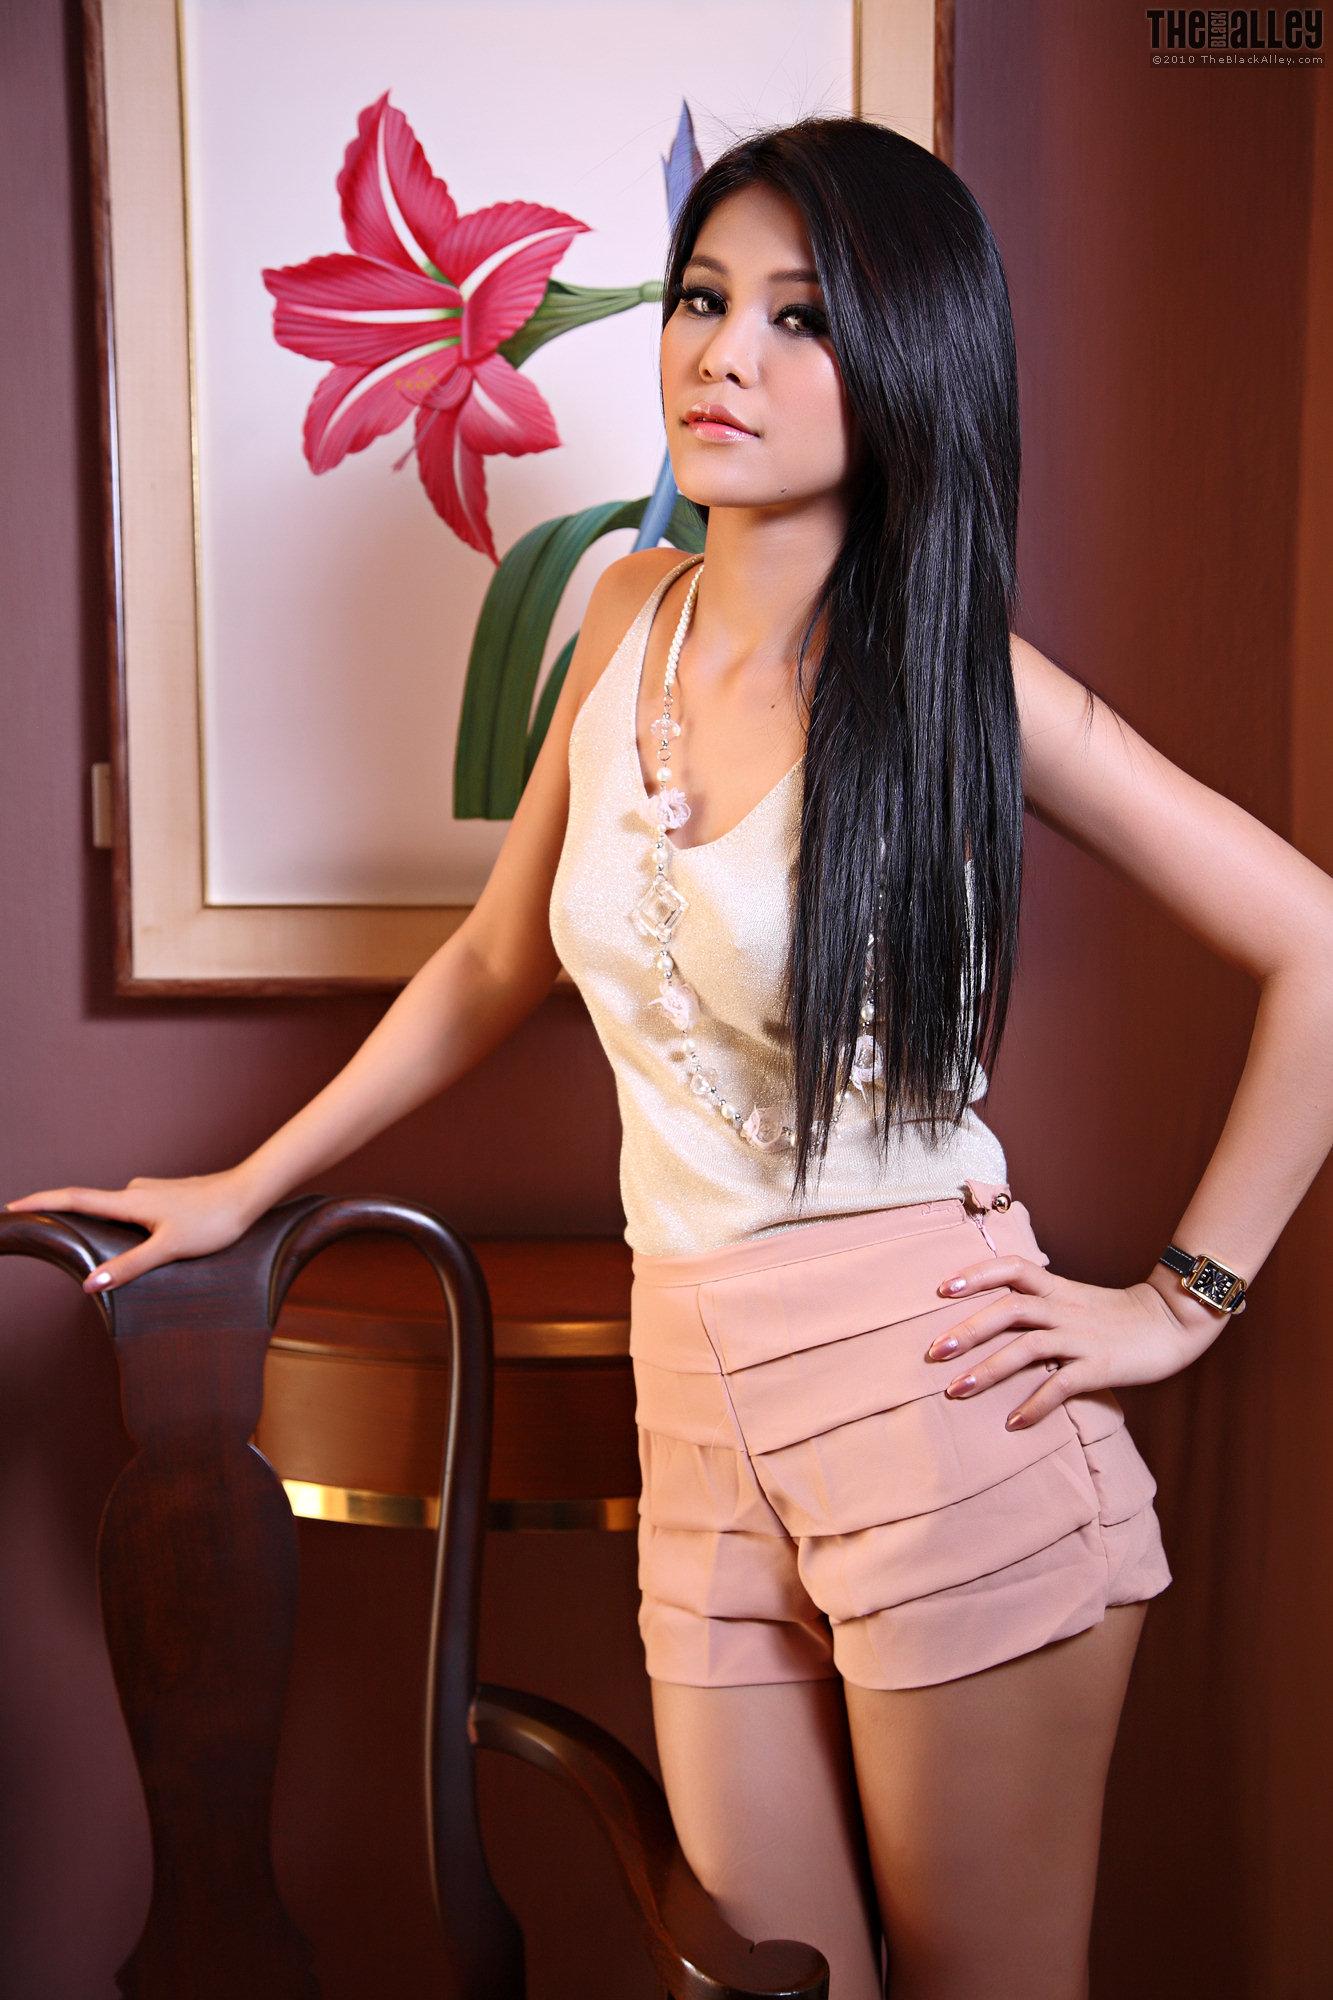 litu 100 archives: TheBlackAlley Babes Jinny Yun Set 08